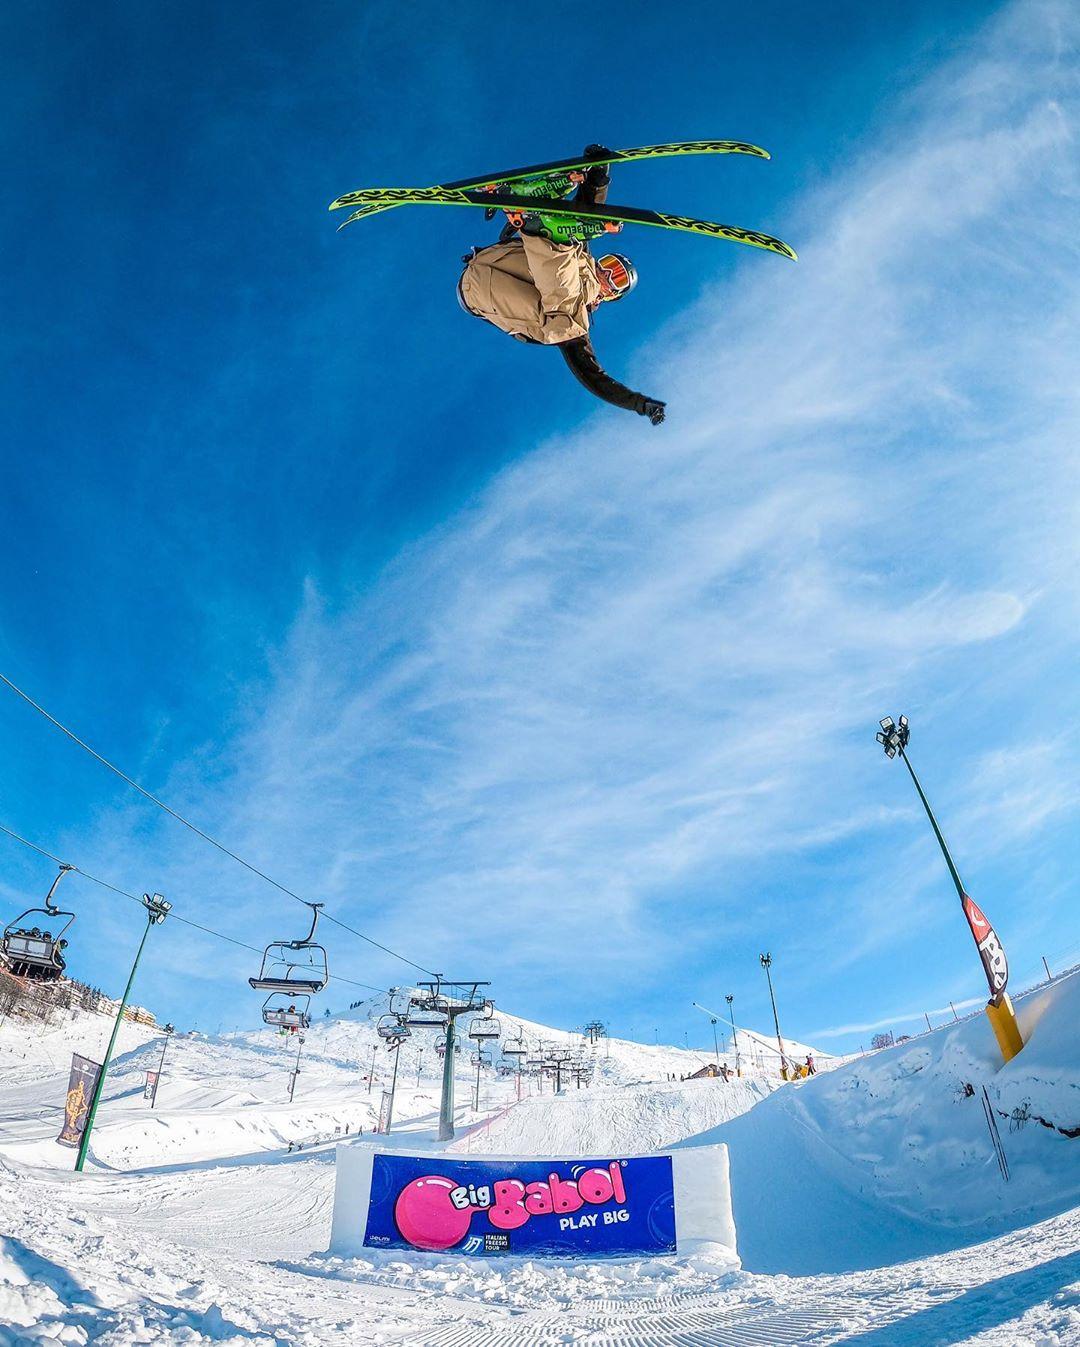 big babol italian freeski tour prato nevoso ski freeski italia